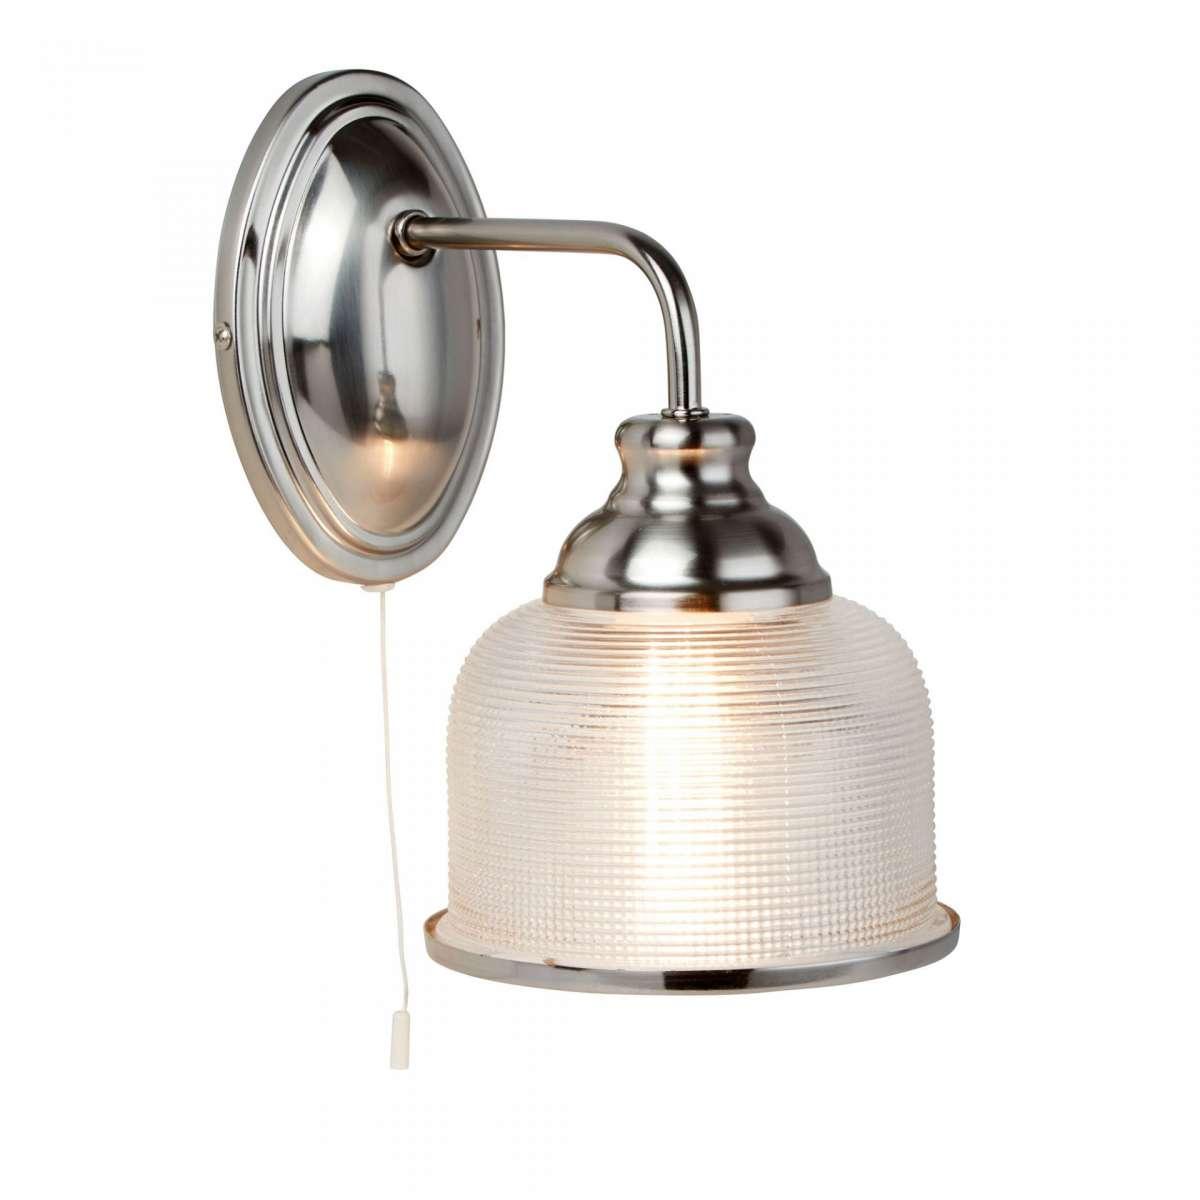 Bistro II 1 Light Wall Bracket Satin Silver With Halophane Glass